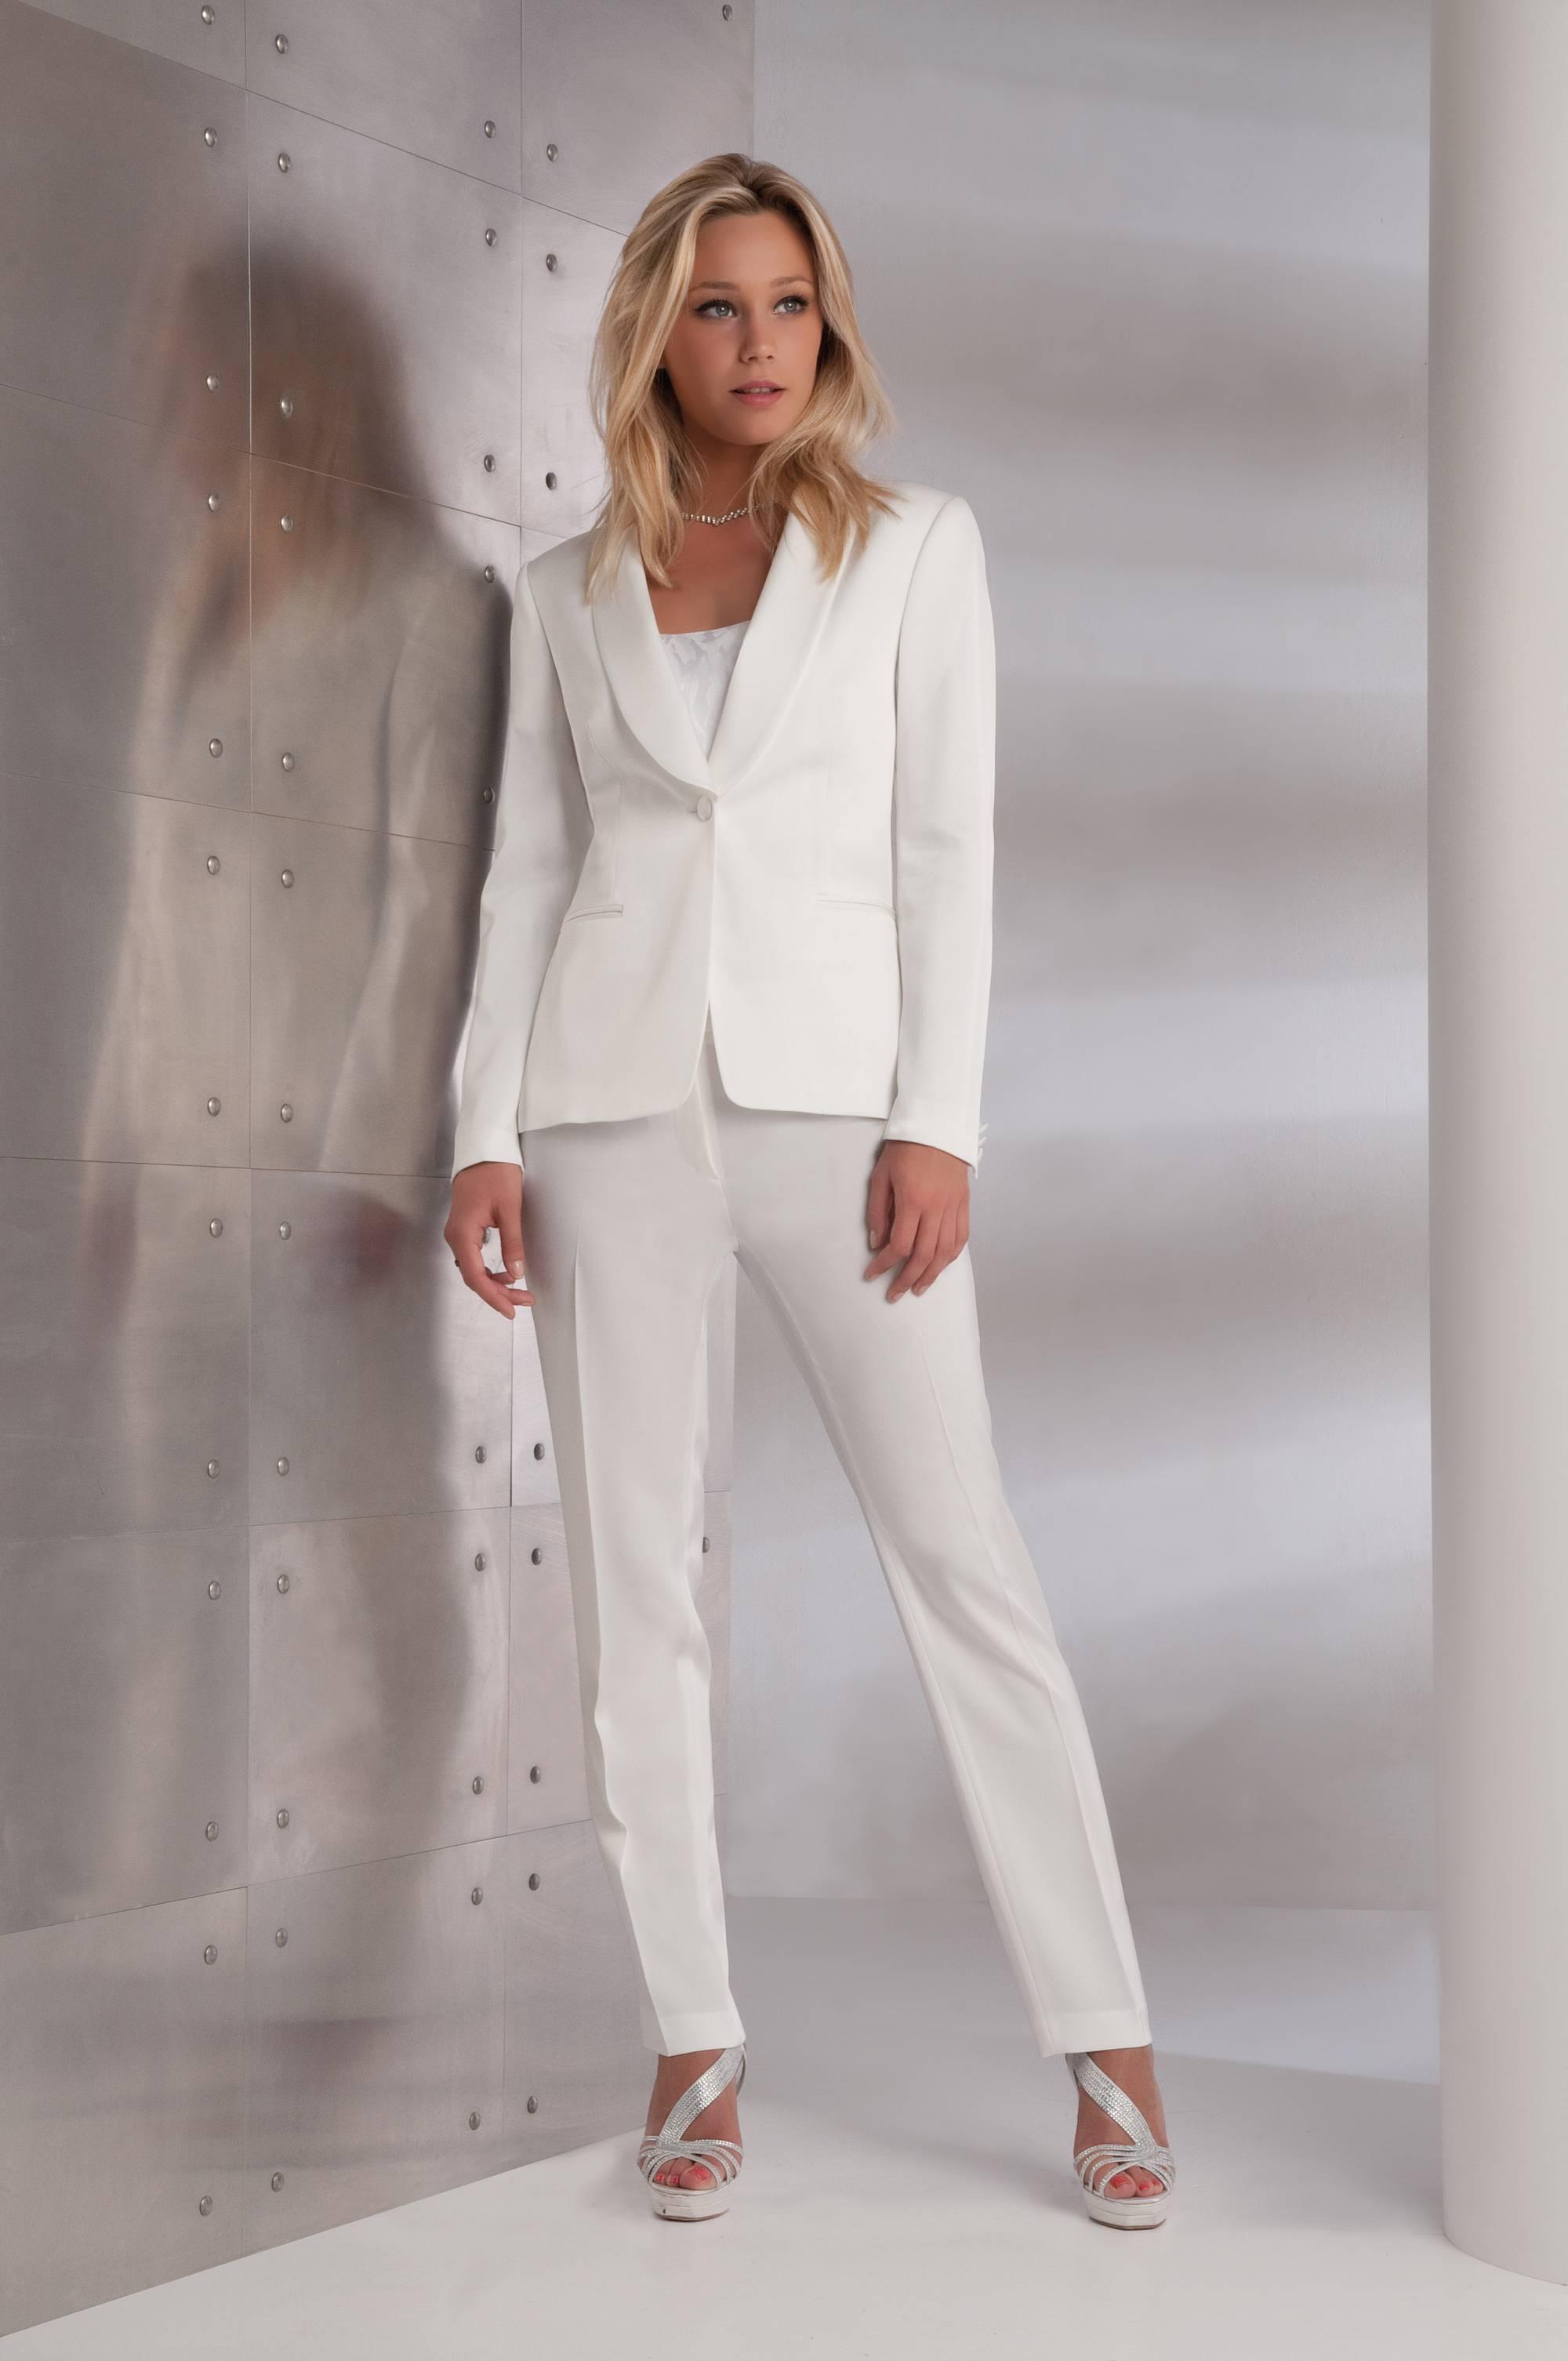 Blanche Fitness Ceremonie Et Vetement Femme Veste Mode q1ZxwUUpz